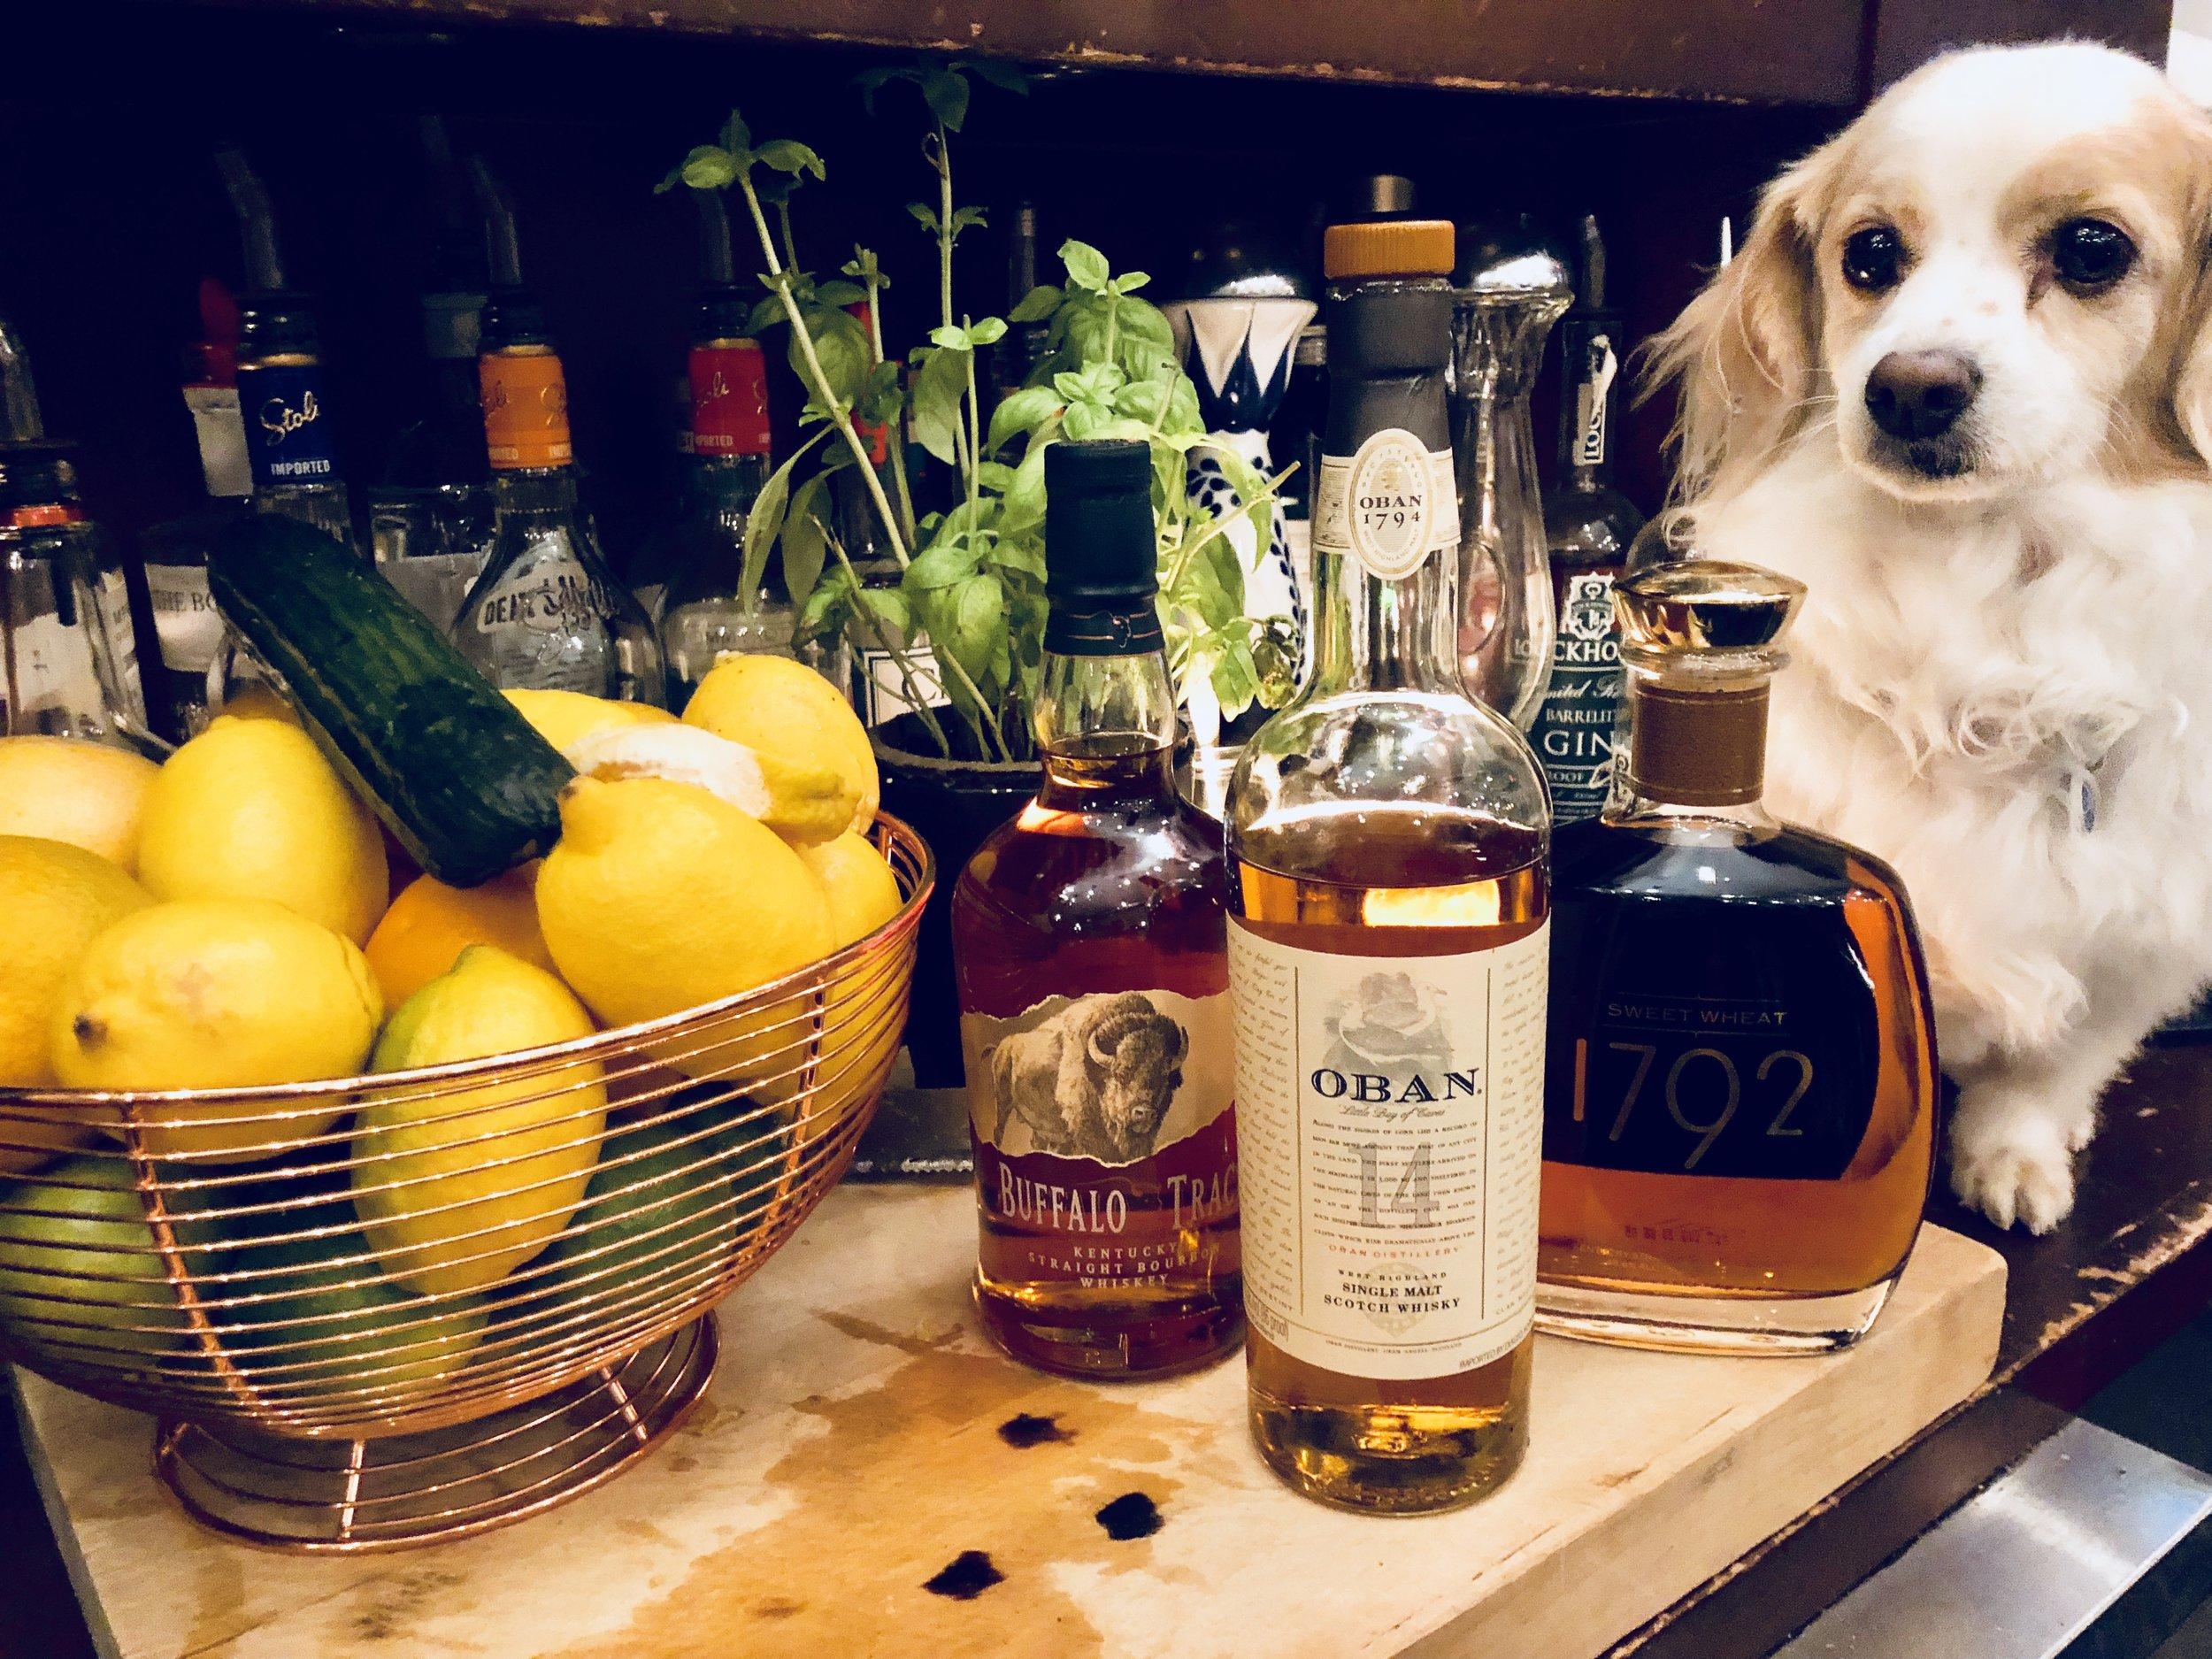 lucy whiskey.jpg